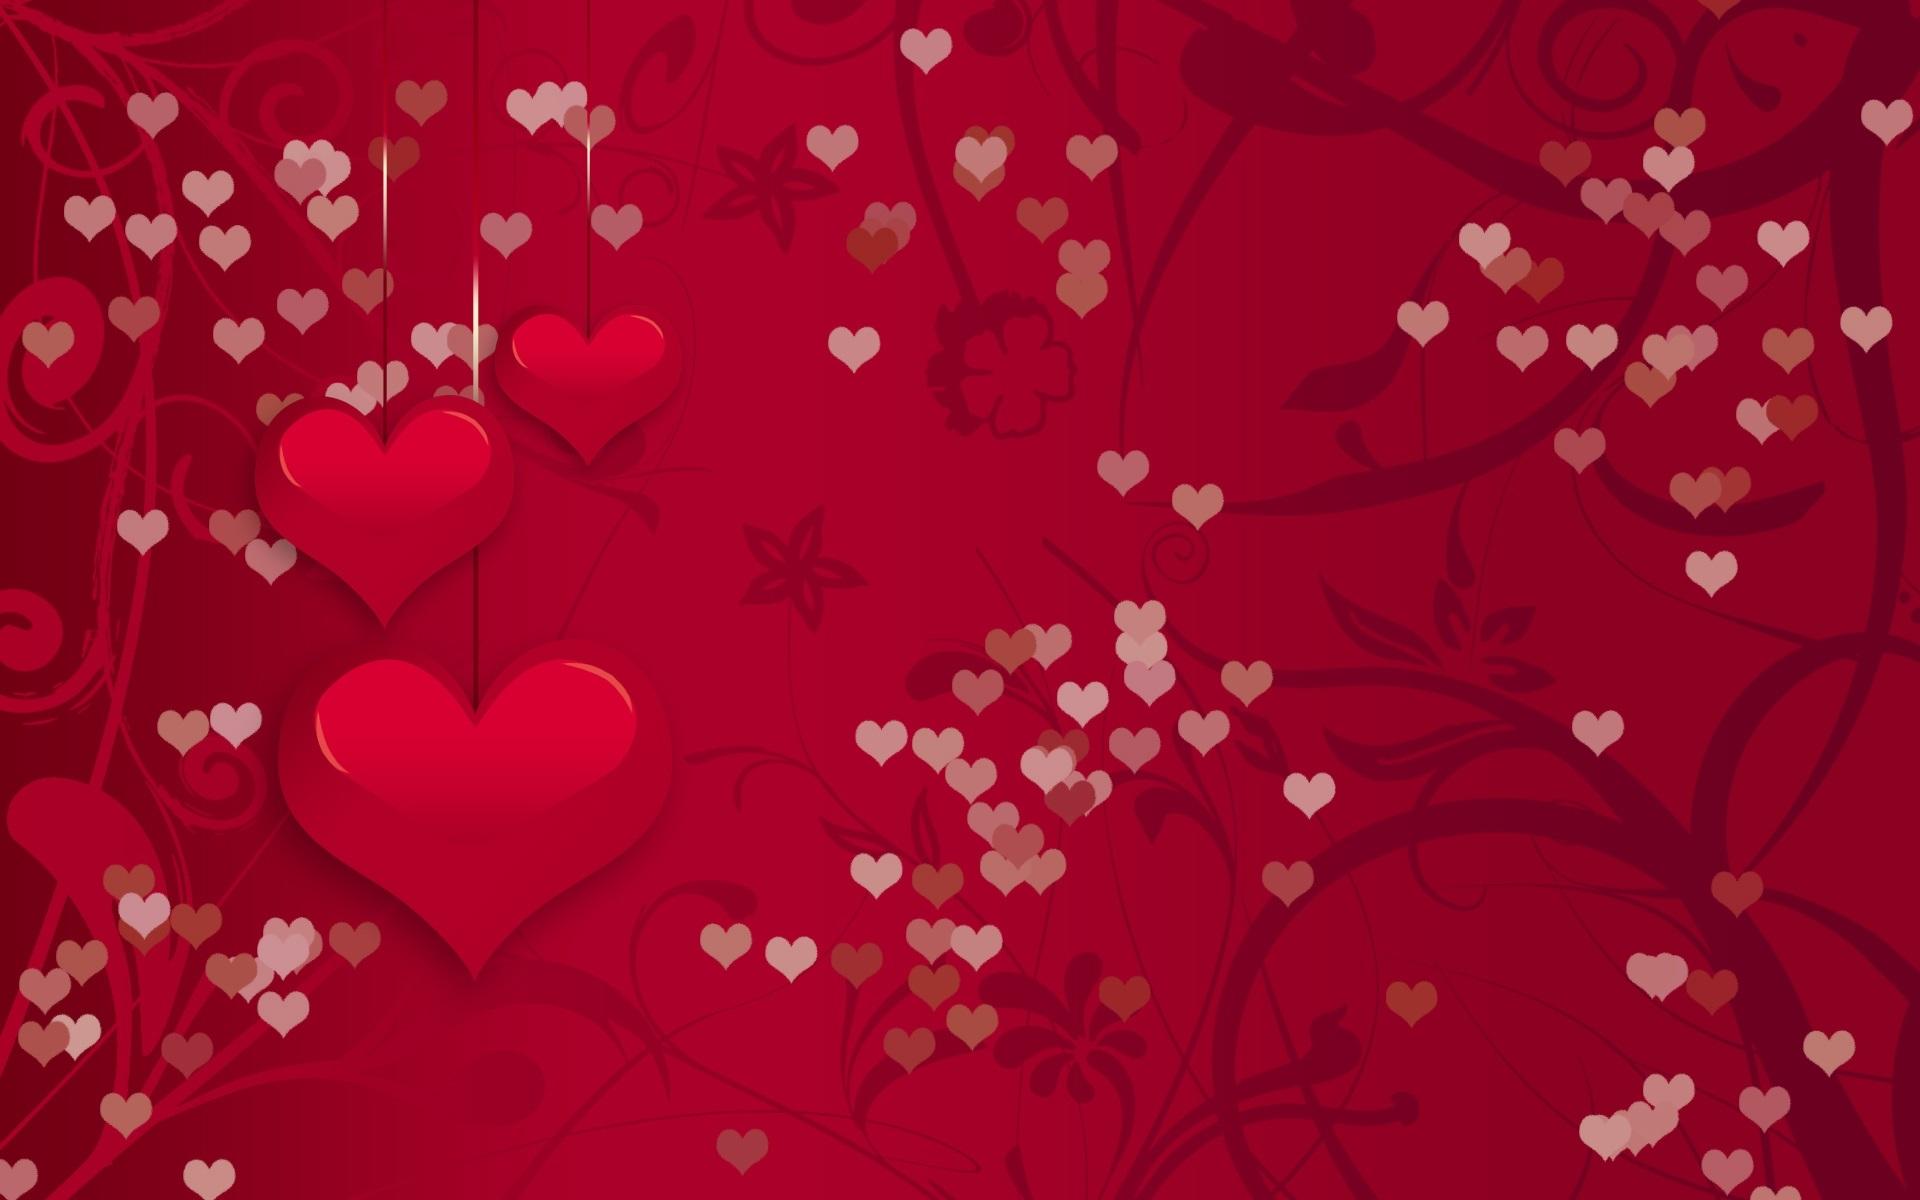 Картинки с сердечками Красивые: Обои на телефон с сердечками